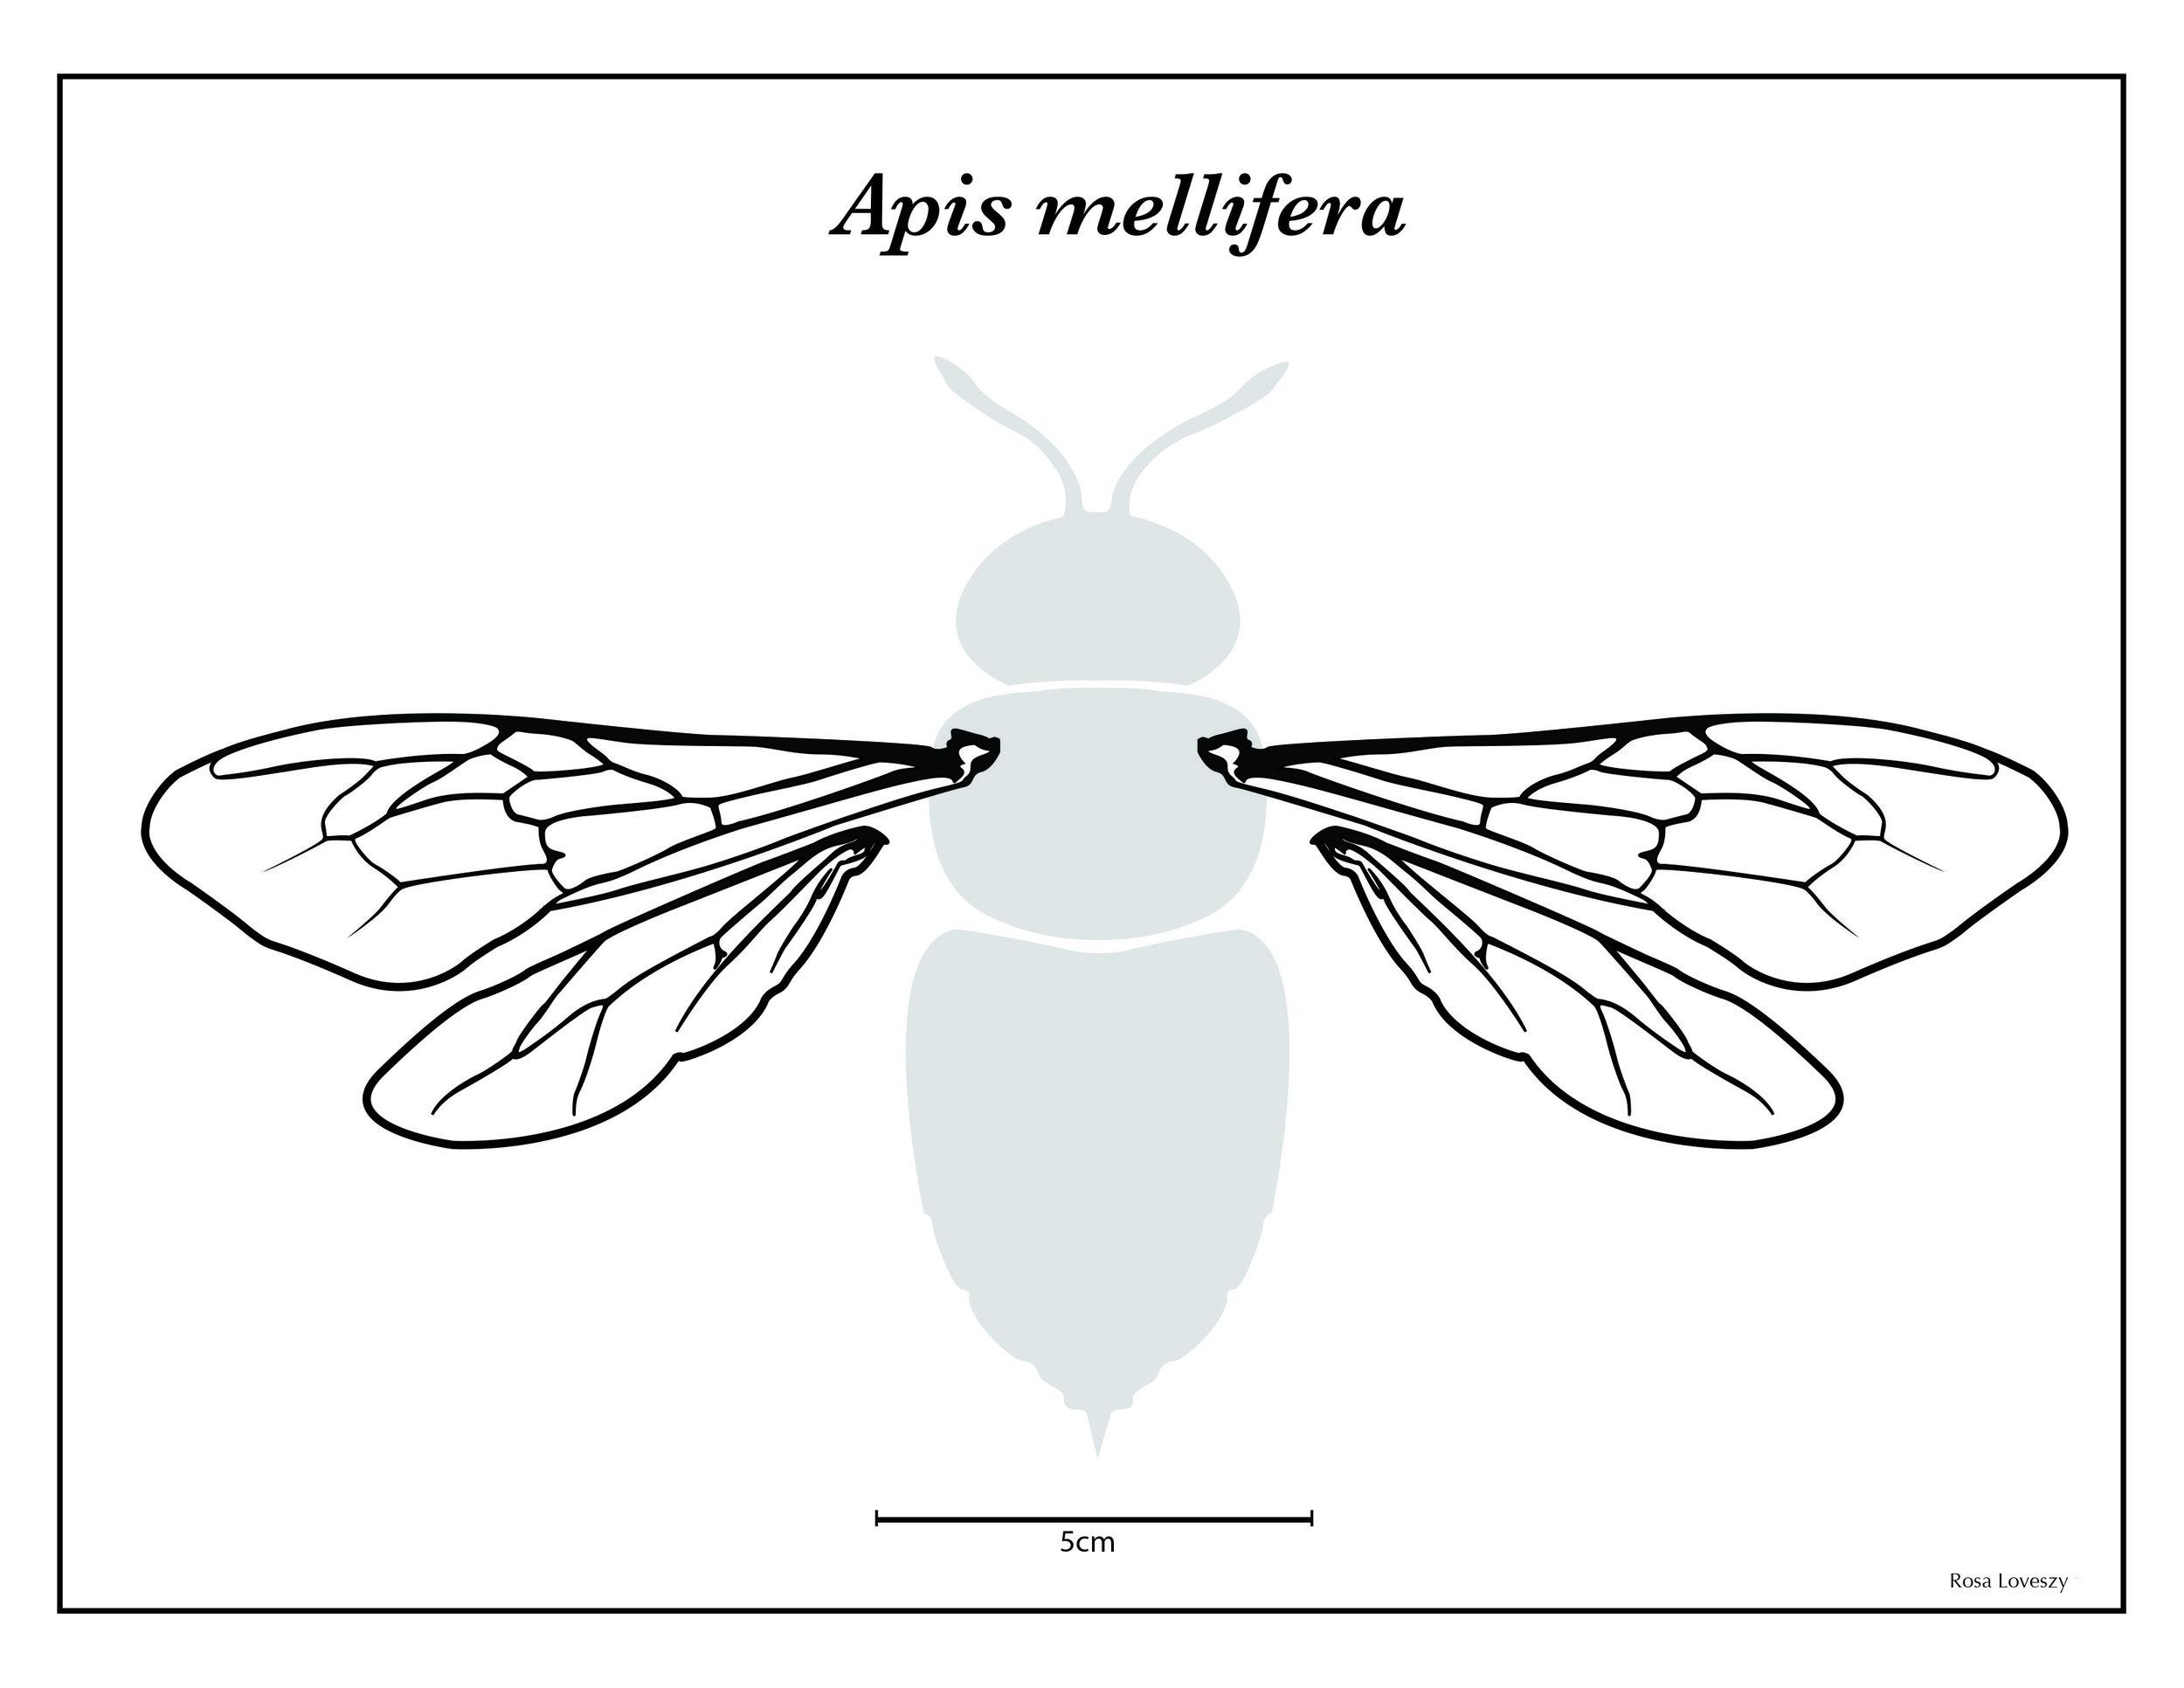 Apis mellifera